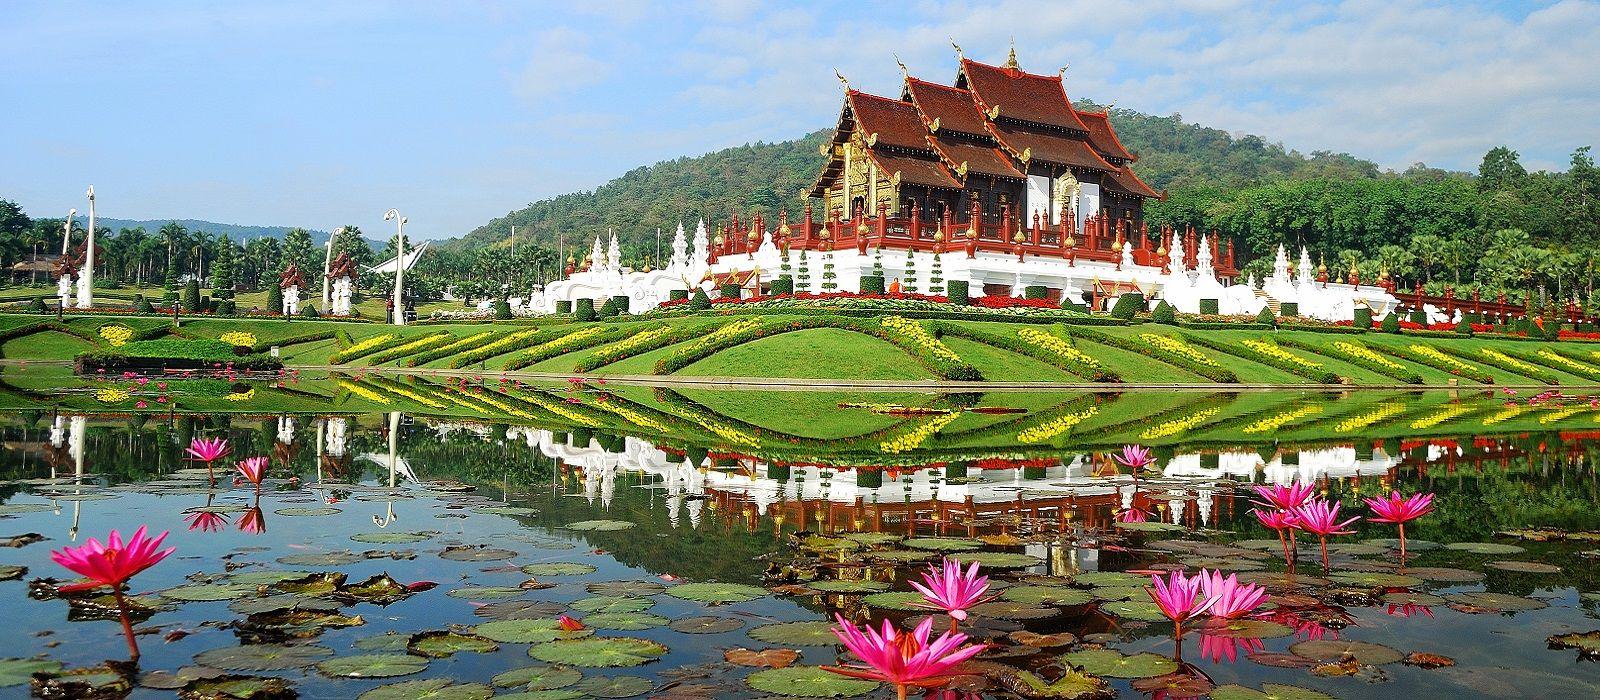 Thailand's Northern Heart and Koh Samui Beach Tour Trip 2